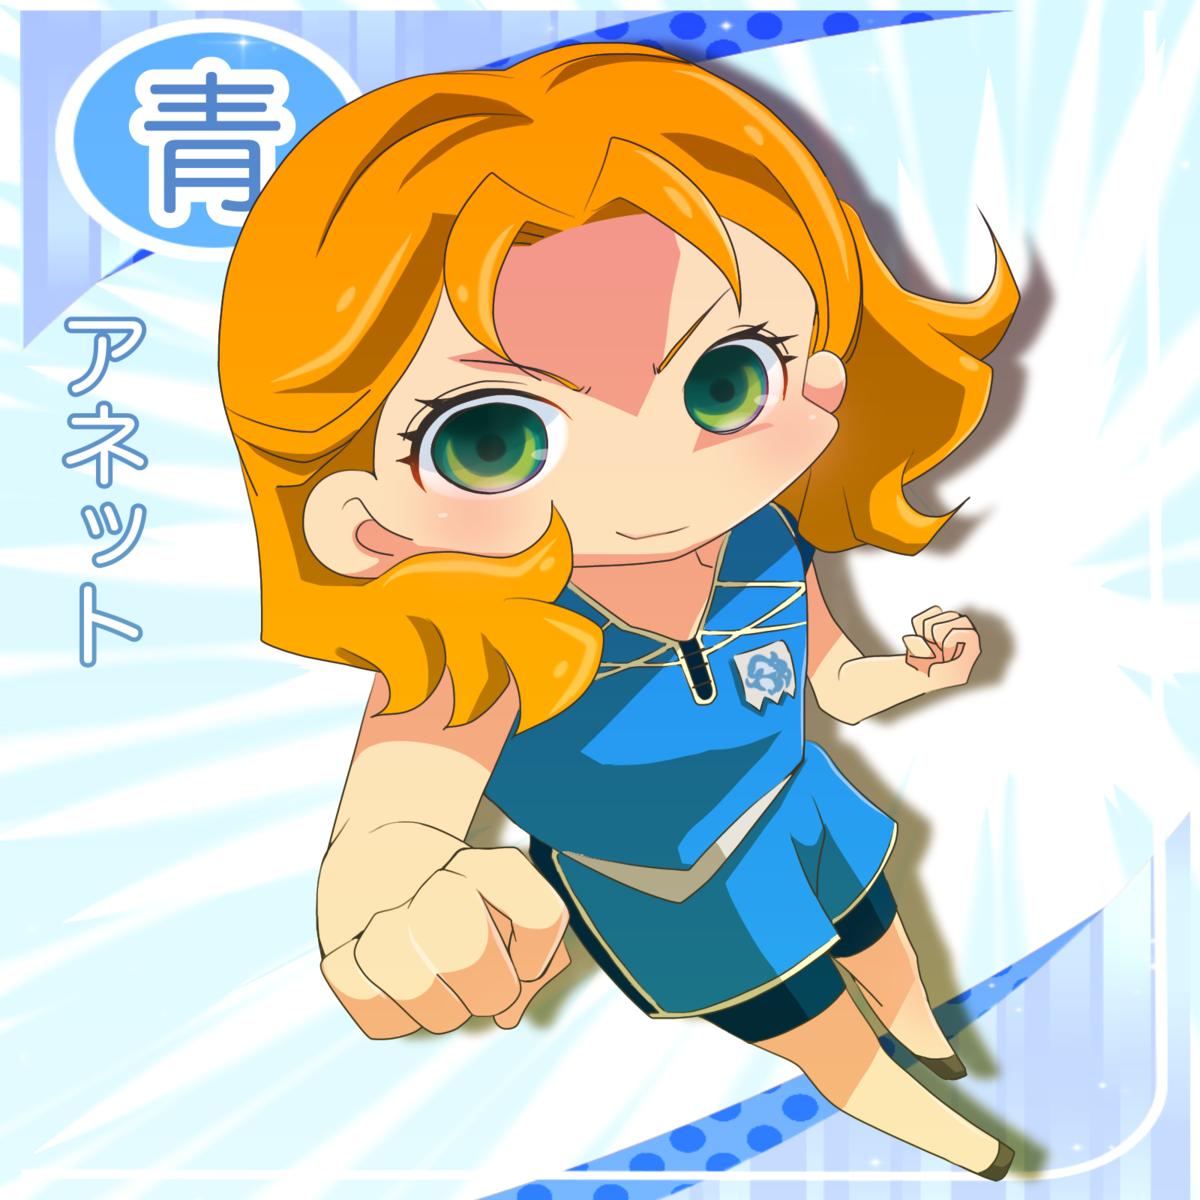 f:id:yoyogi:20201115152449p:plain